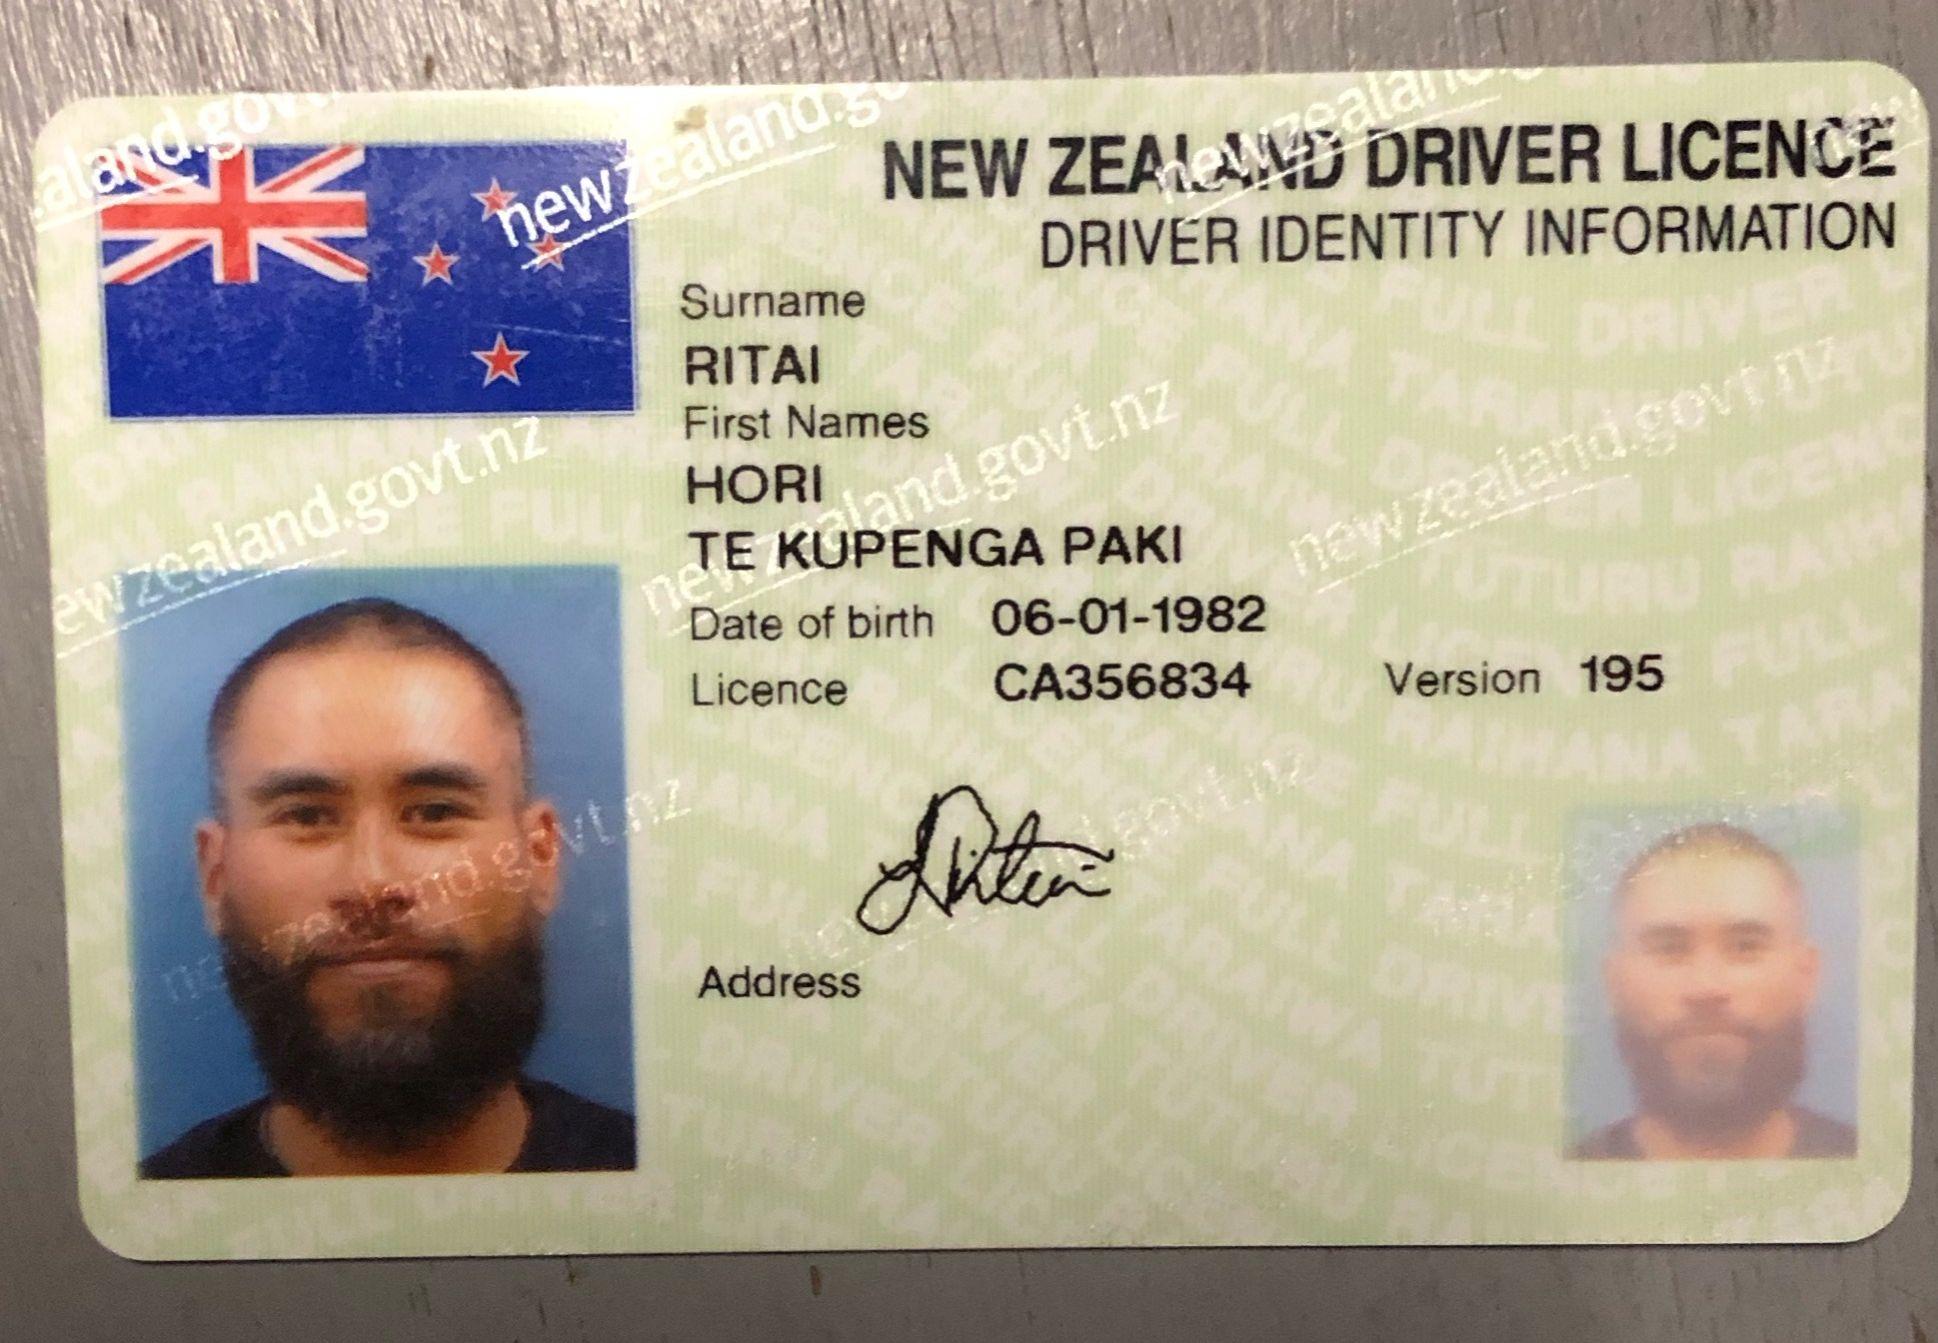 06e591ddad063b9b9e280d5e5e41f12d - How Long Does It Take To Get A Restricted License